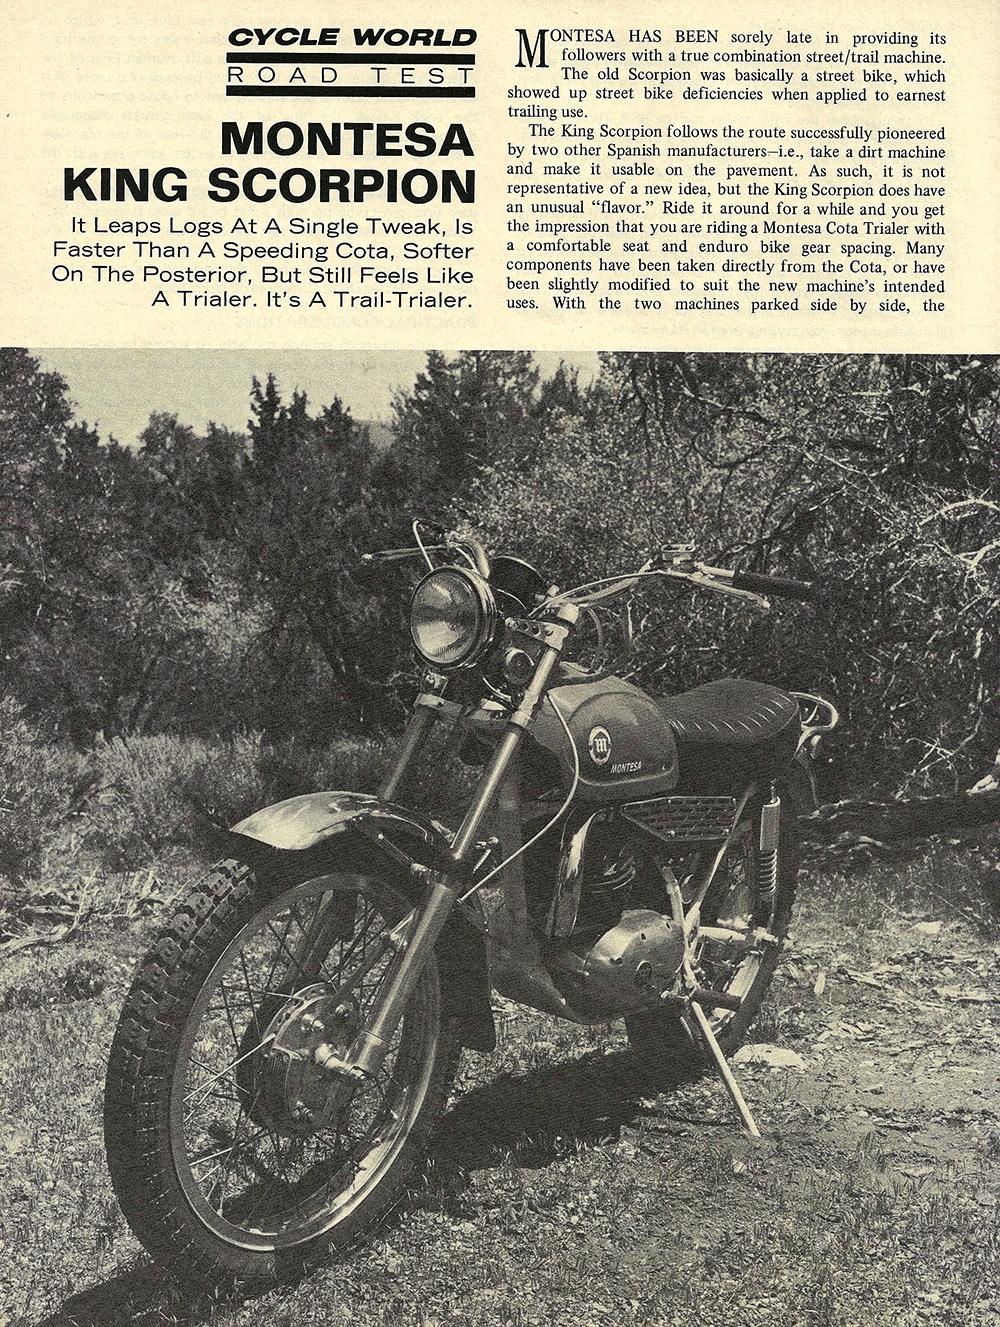 1970 Montesa King Scorpion road test 01.jpg